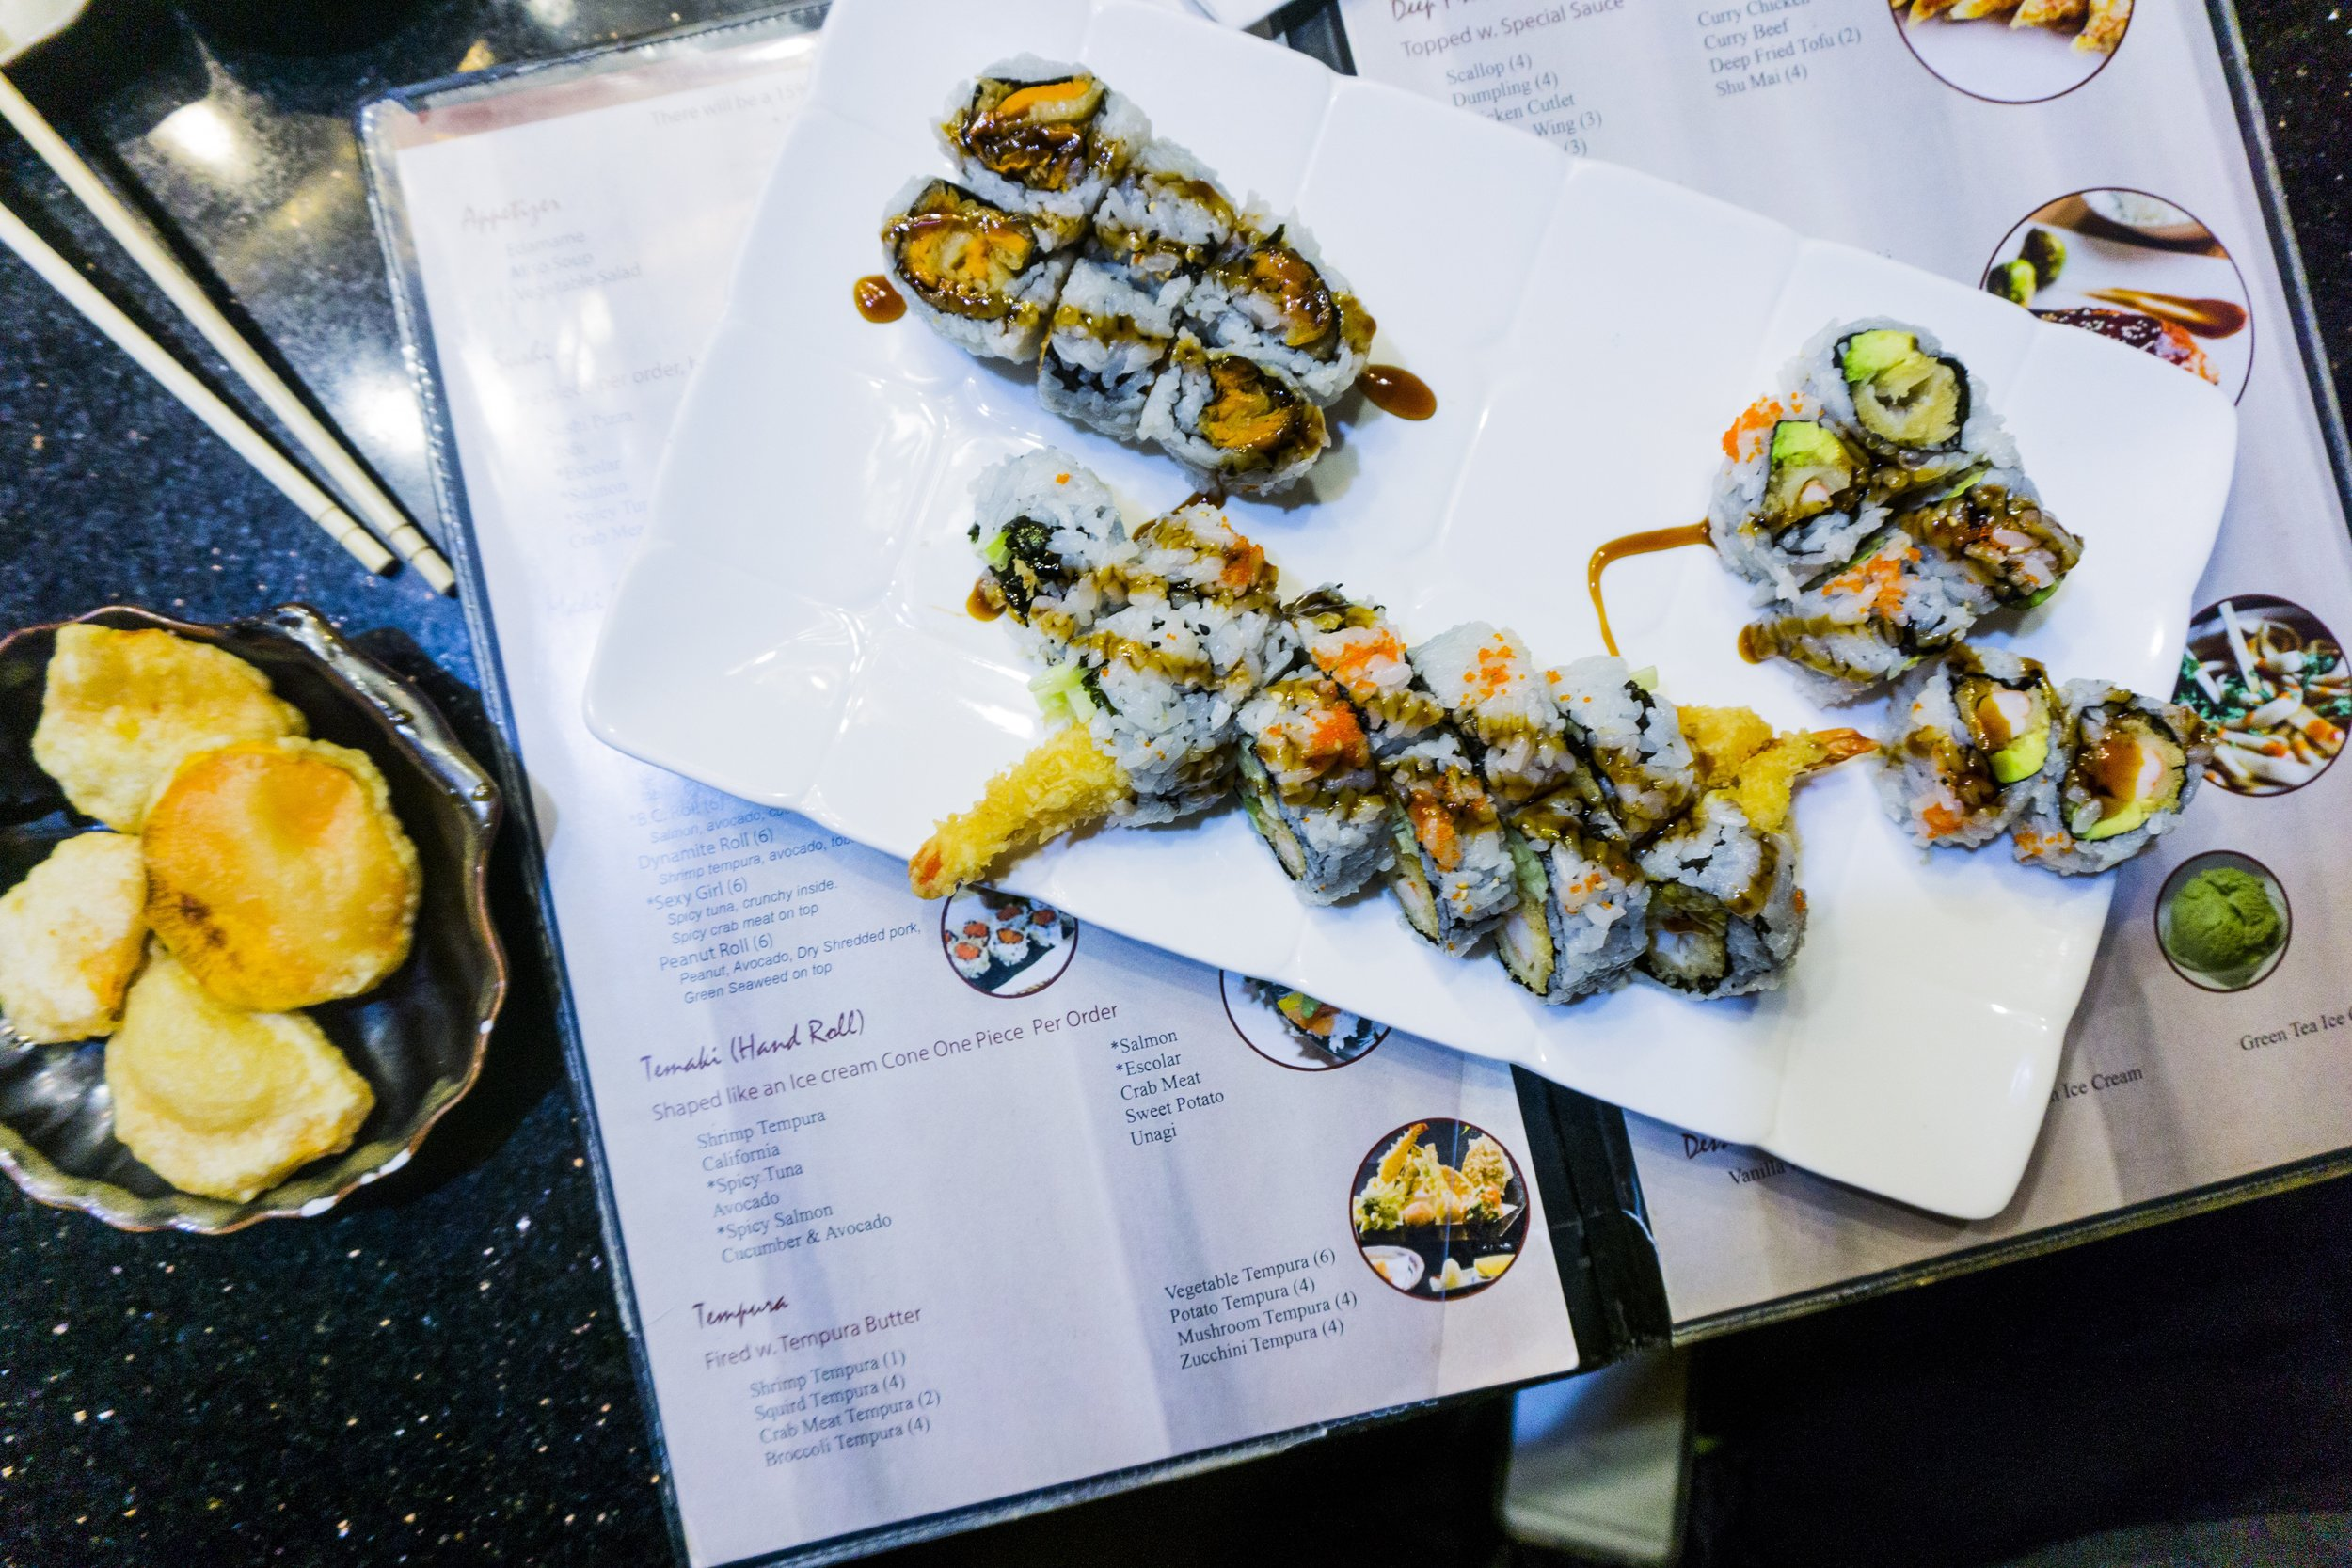 Sushi restaurant in Woodbury, MN. Sushi order. California Rolls. Akita Menu. Food Art